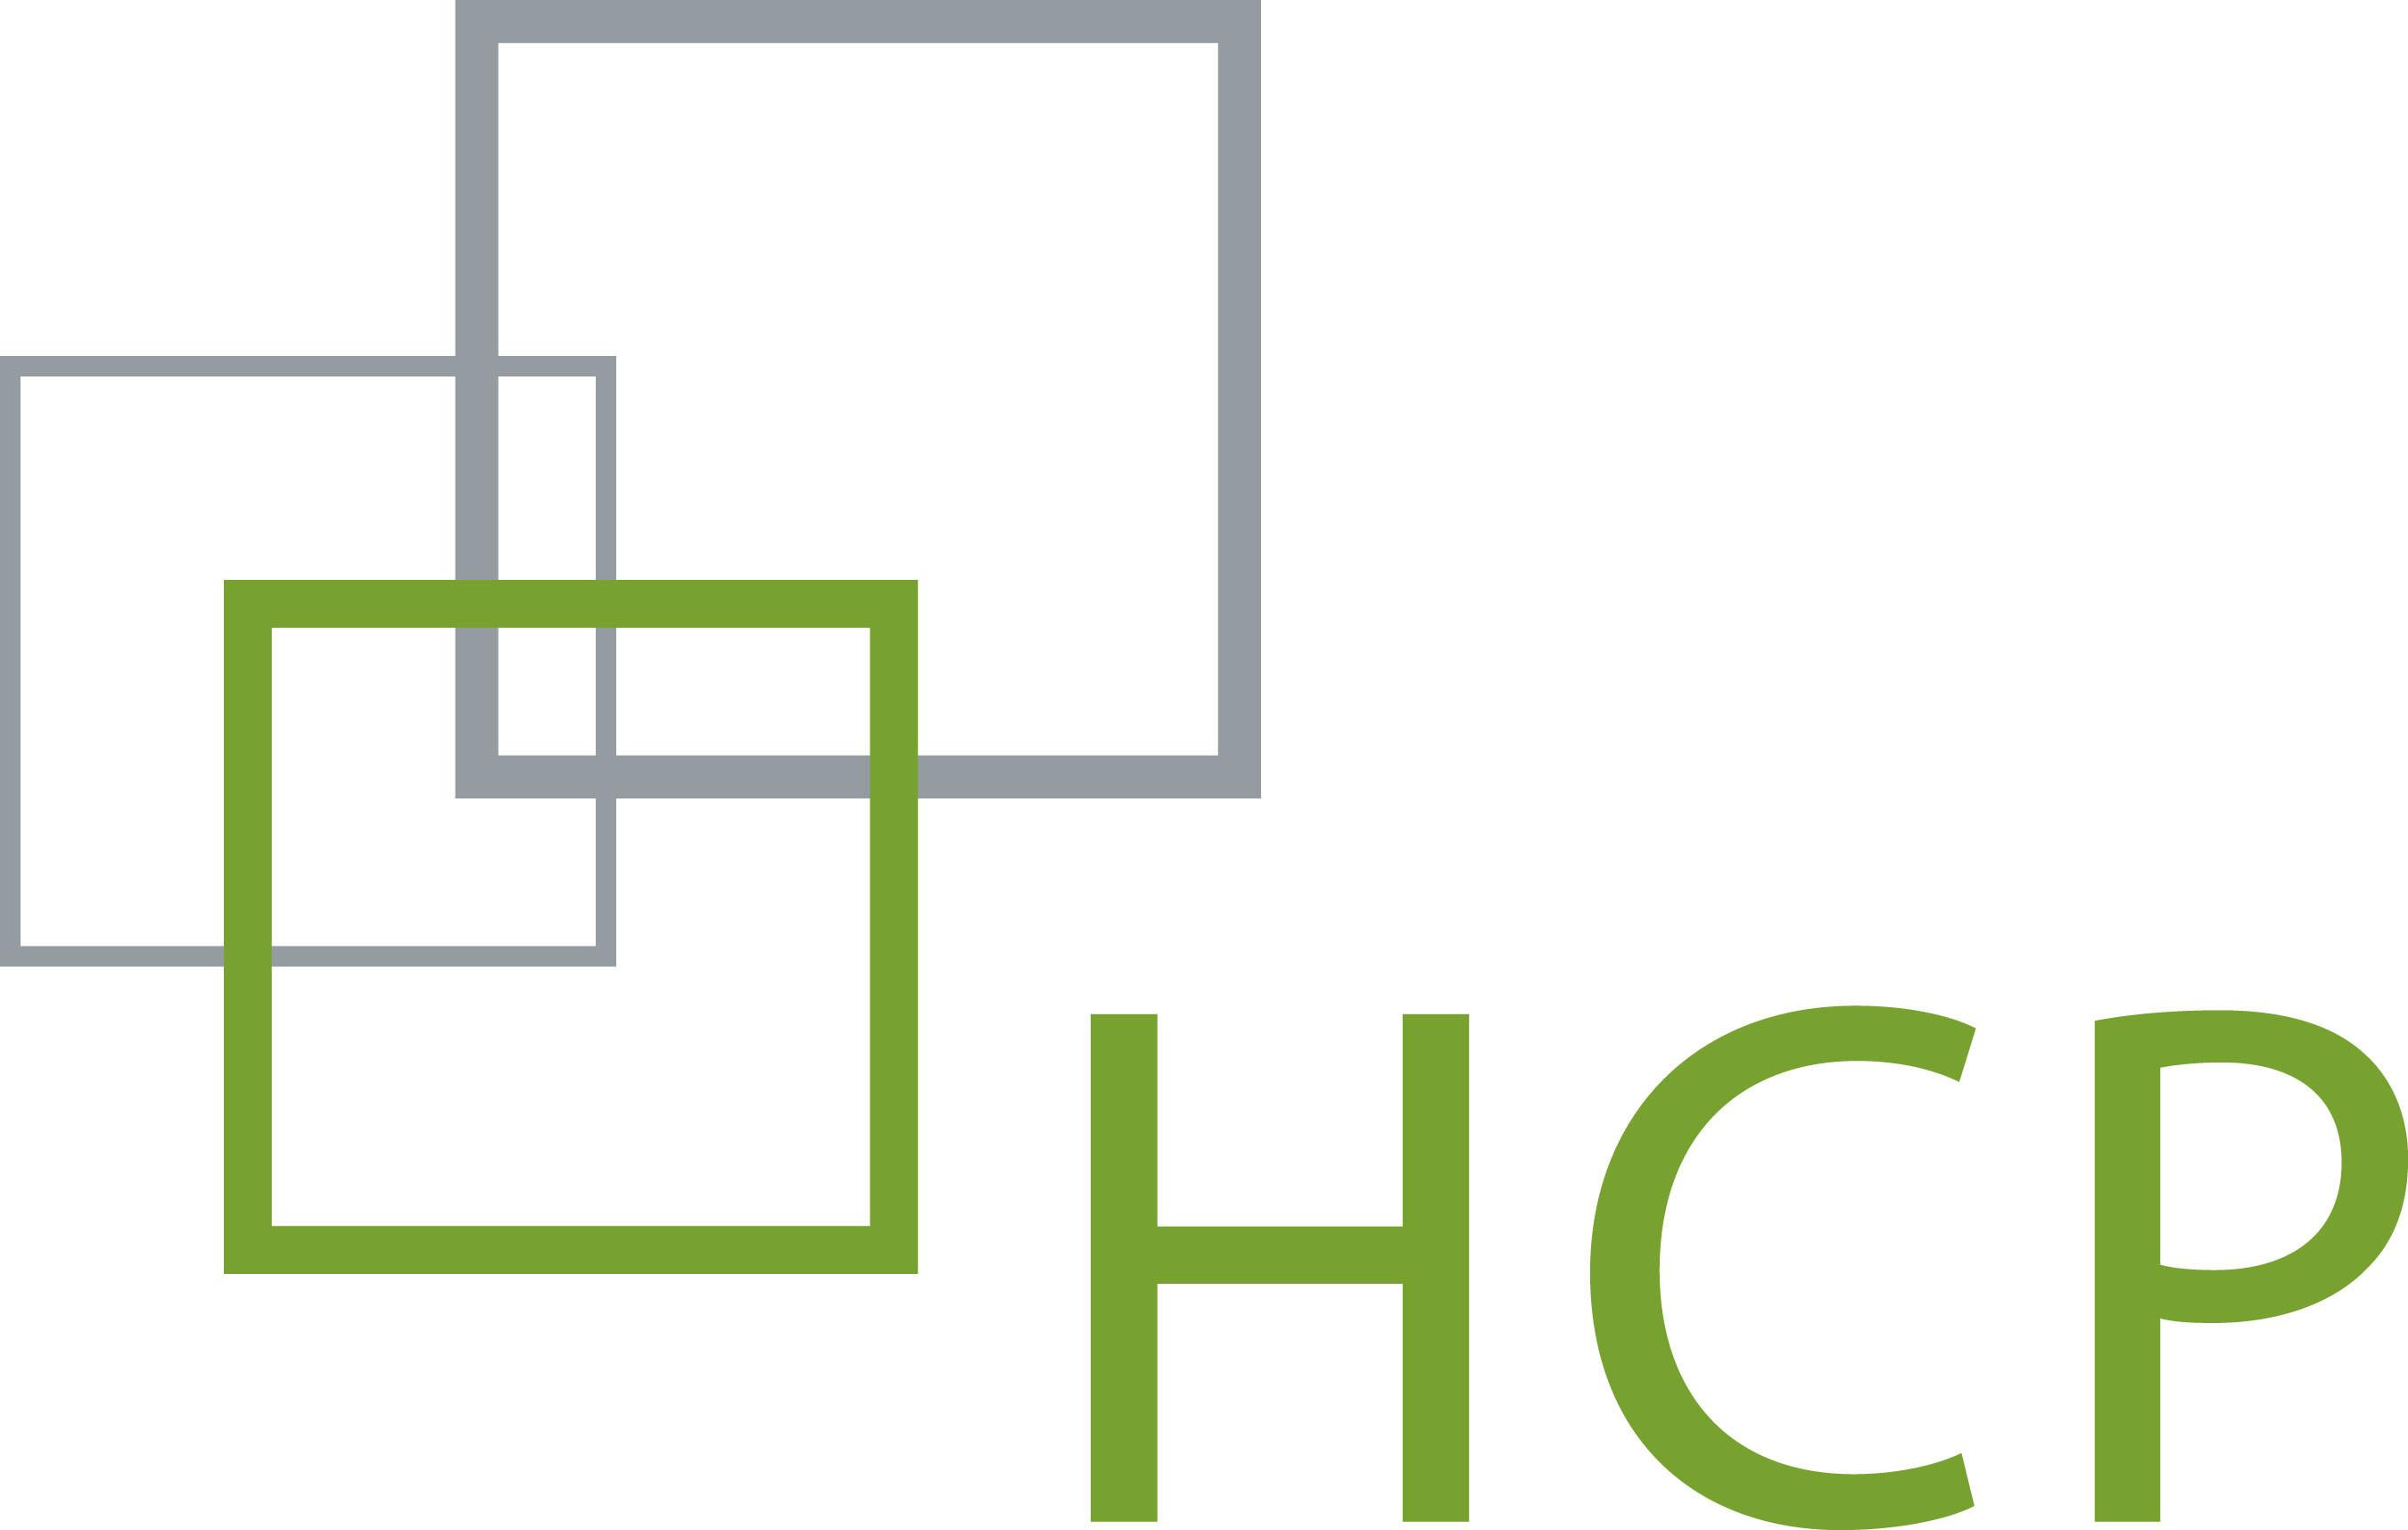 Hcp Inc